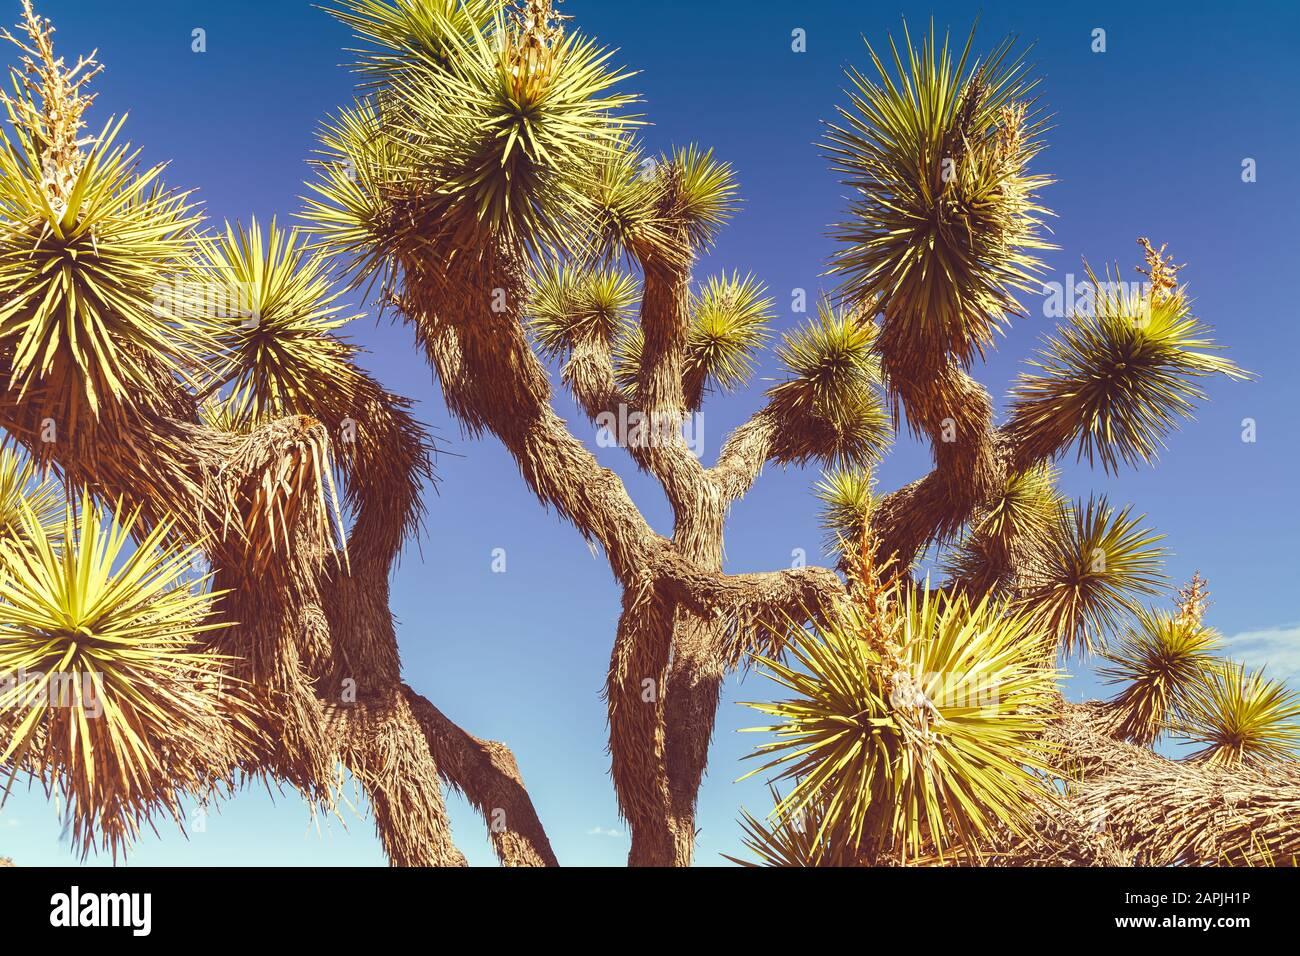 Close up at a Joshua tree, Yucca brevifolia, Joshua Tree National Park, California, United States. Stock Photo